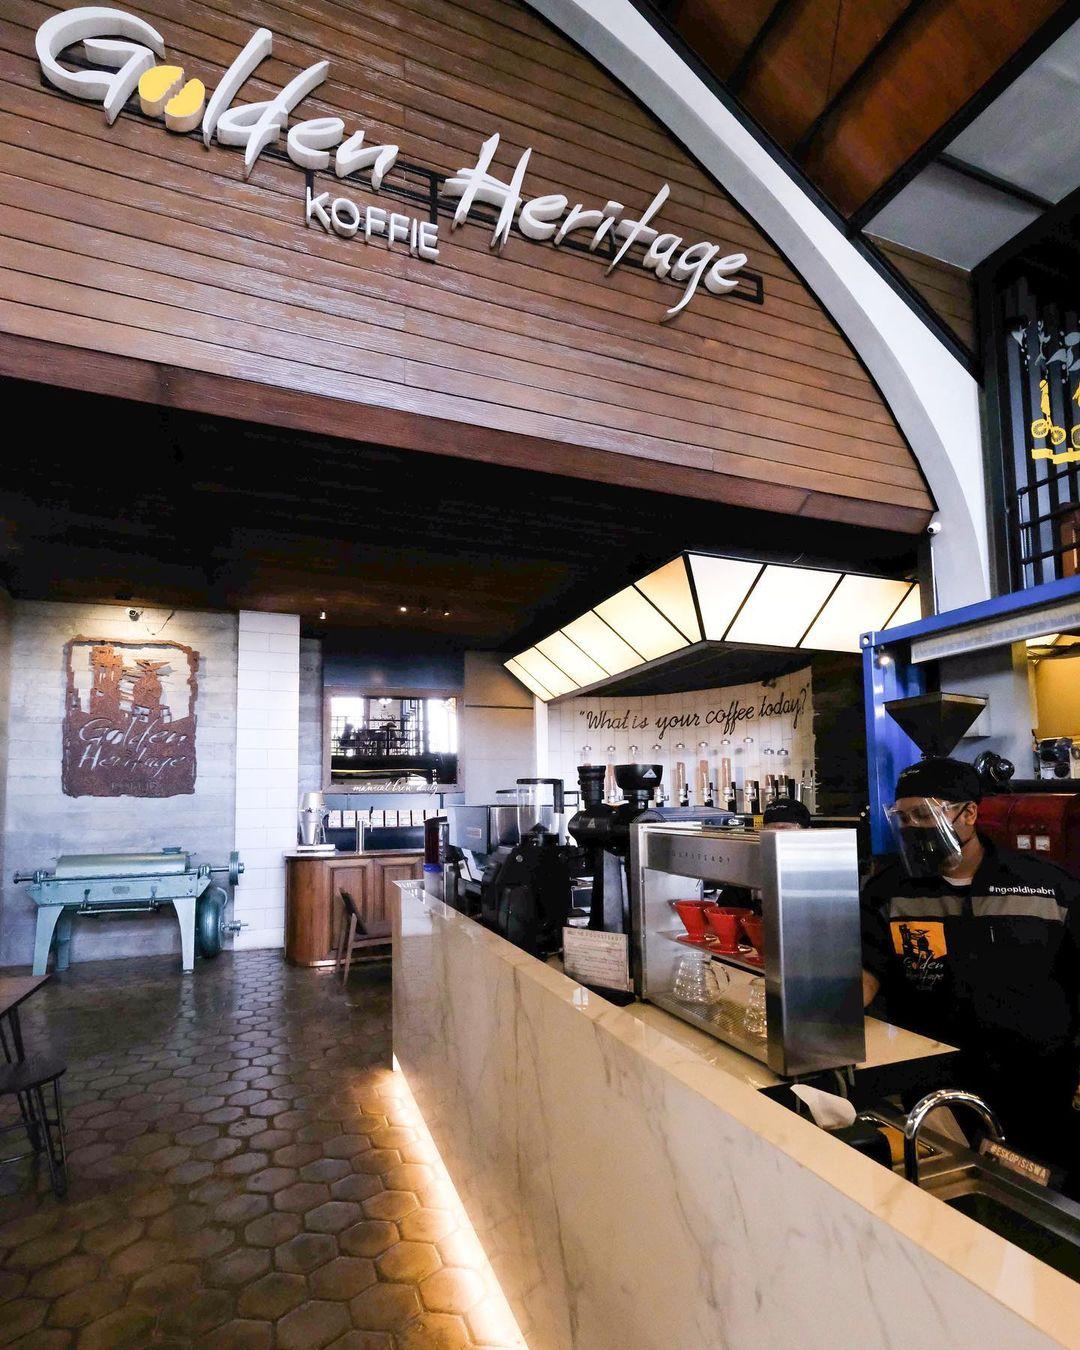 Golden Heritage Koffie, Kedai Kopi Instagramable di Malang